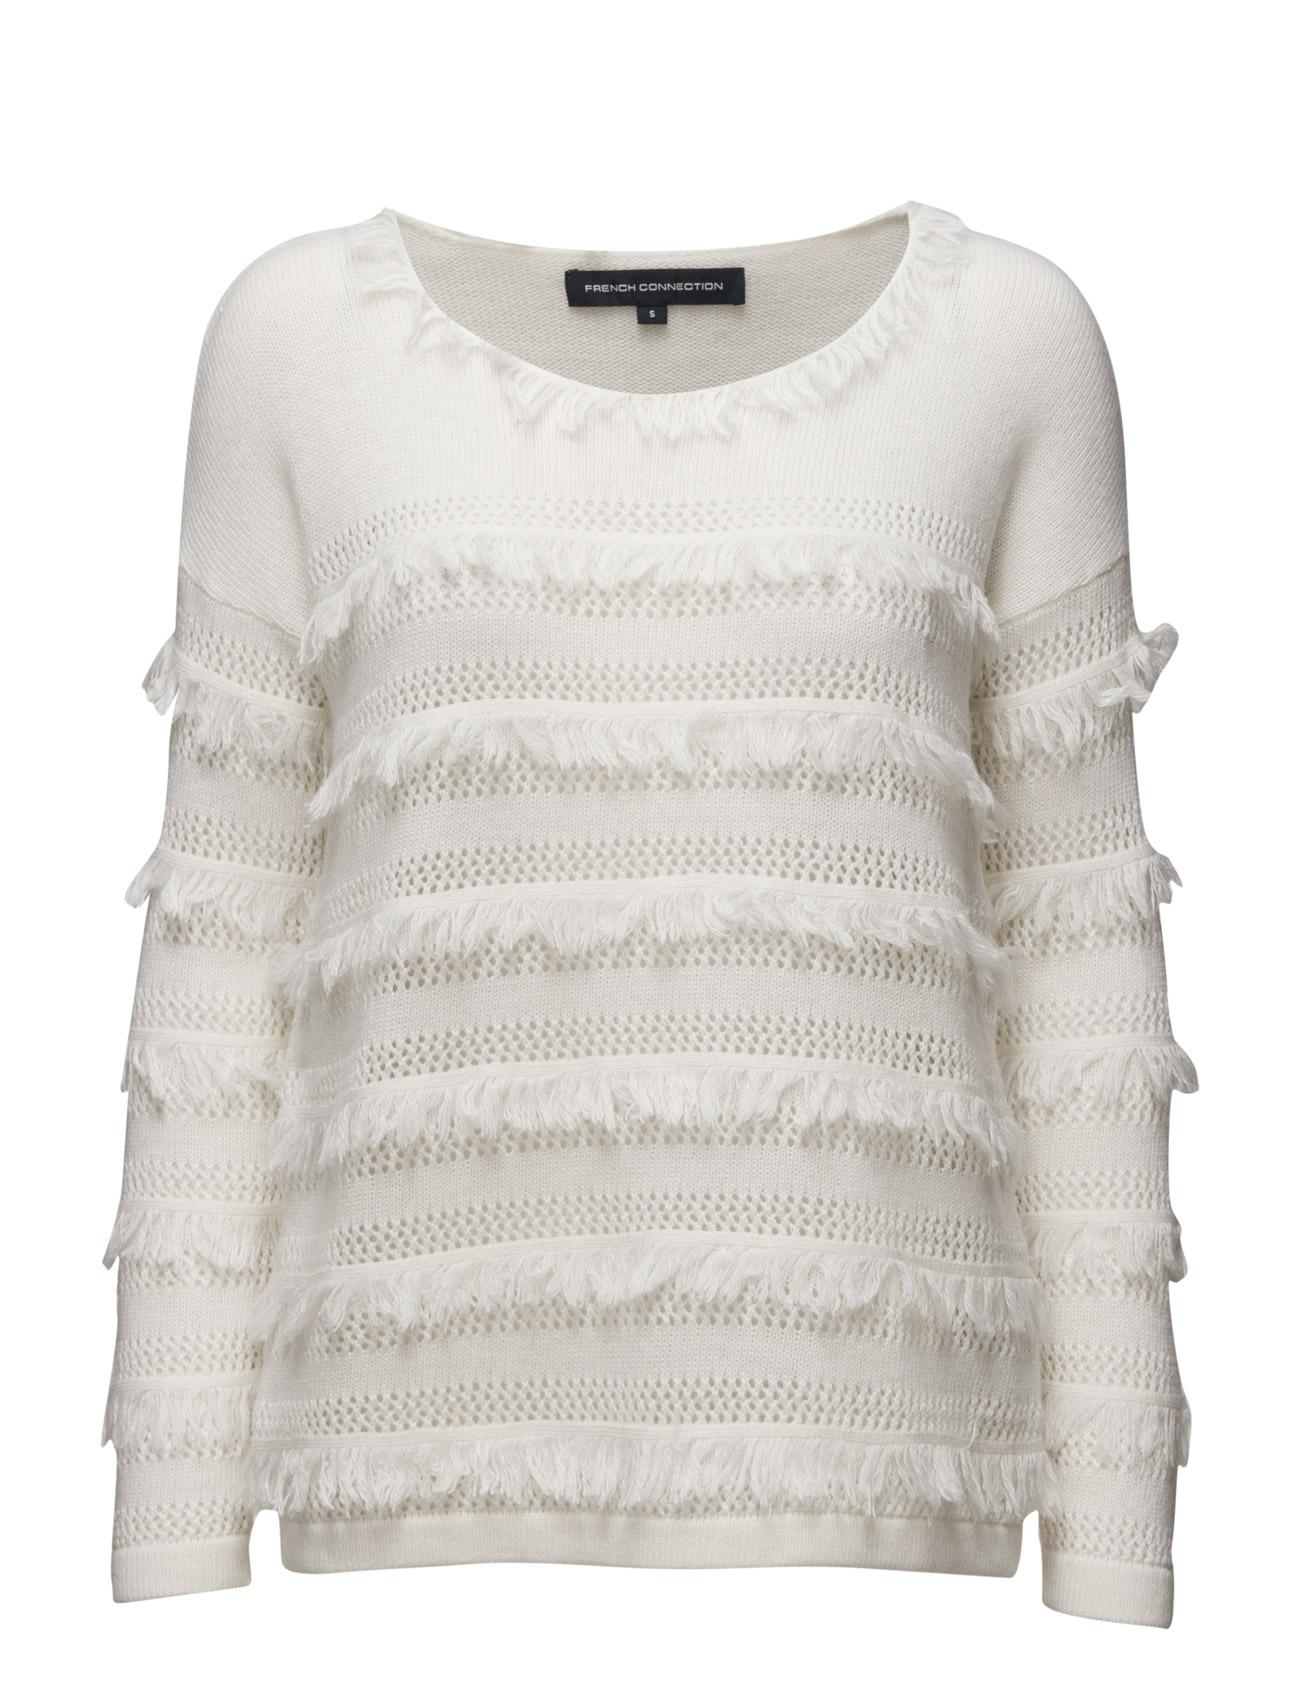 Pointelle Fringing Ls Rdnk Jmp French Connection Sweatshirts til Damer i Winter White